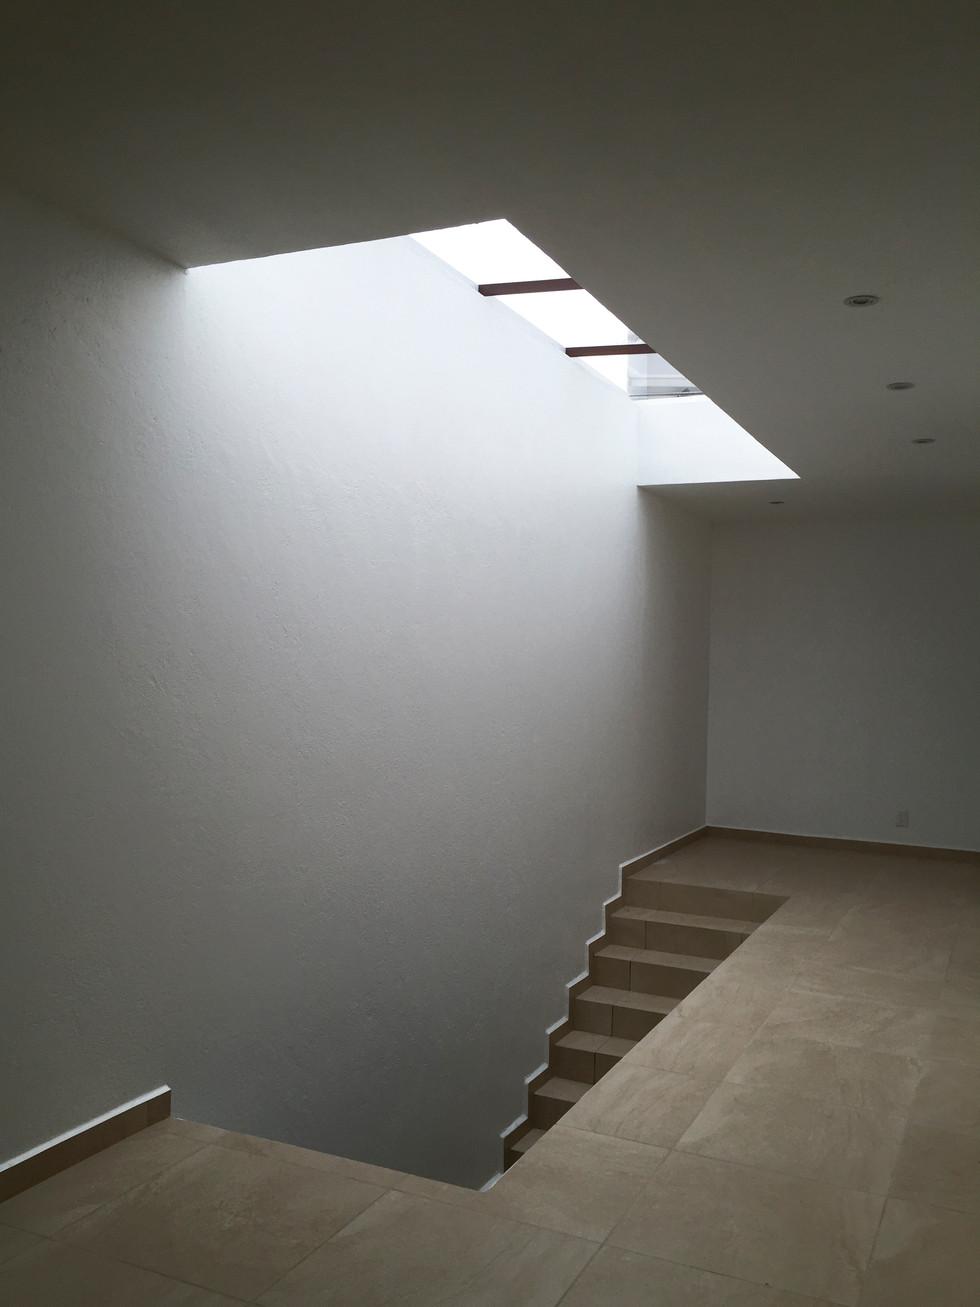 x-Stair and Skylight.jpg